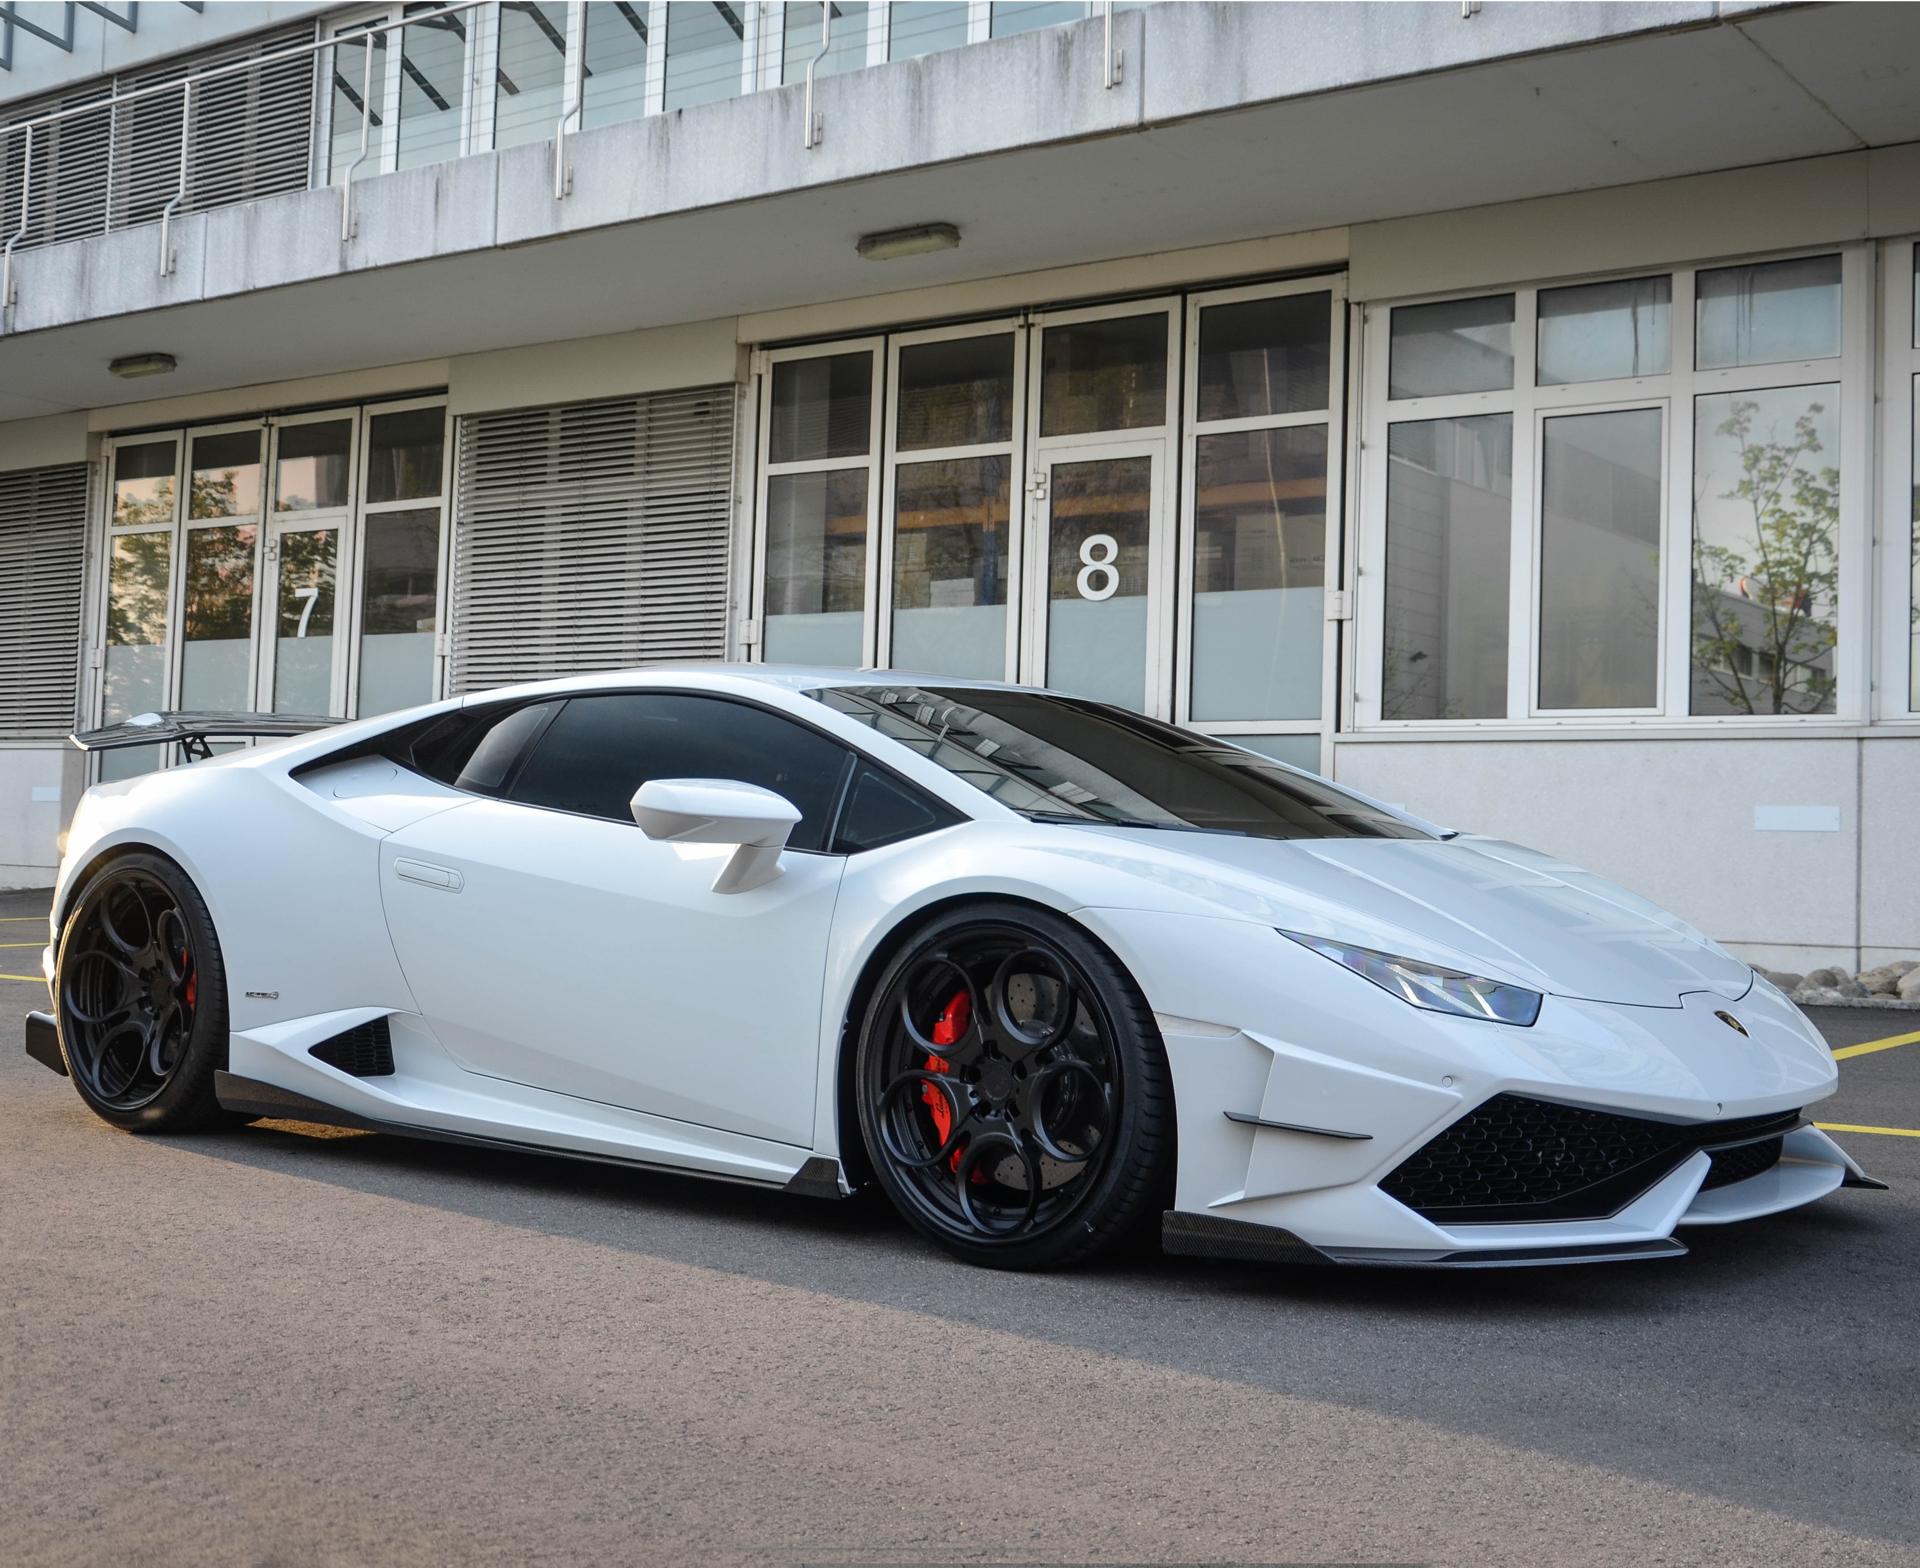 DMC Affari: Carbon Fiber Body Kit for the Lamborghini Huracan